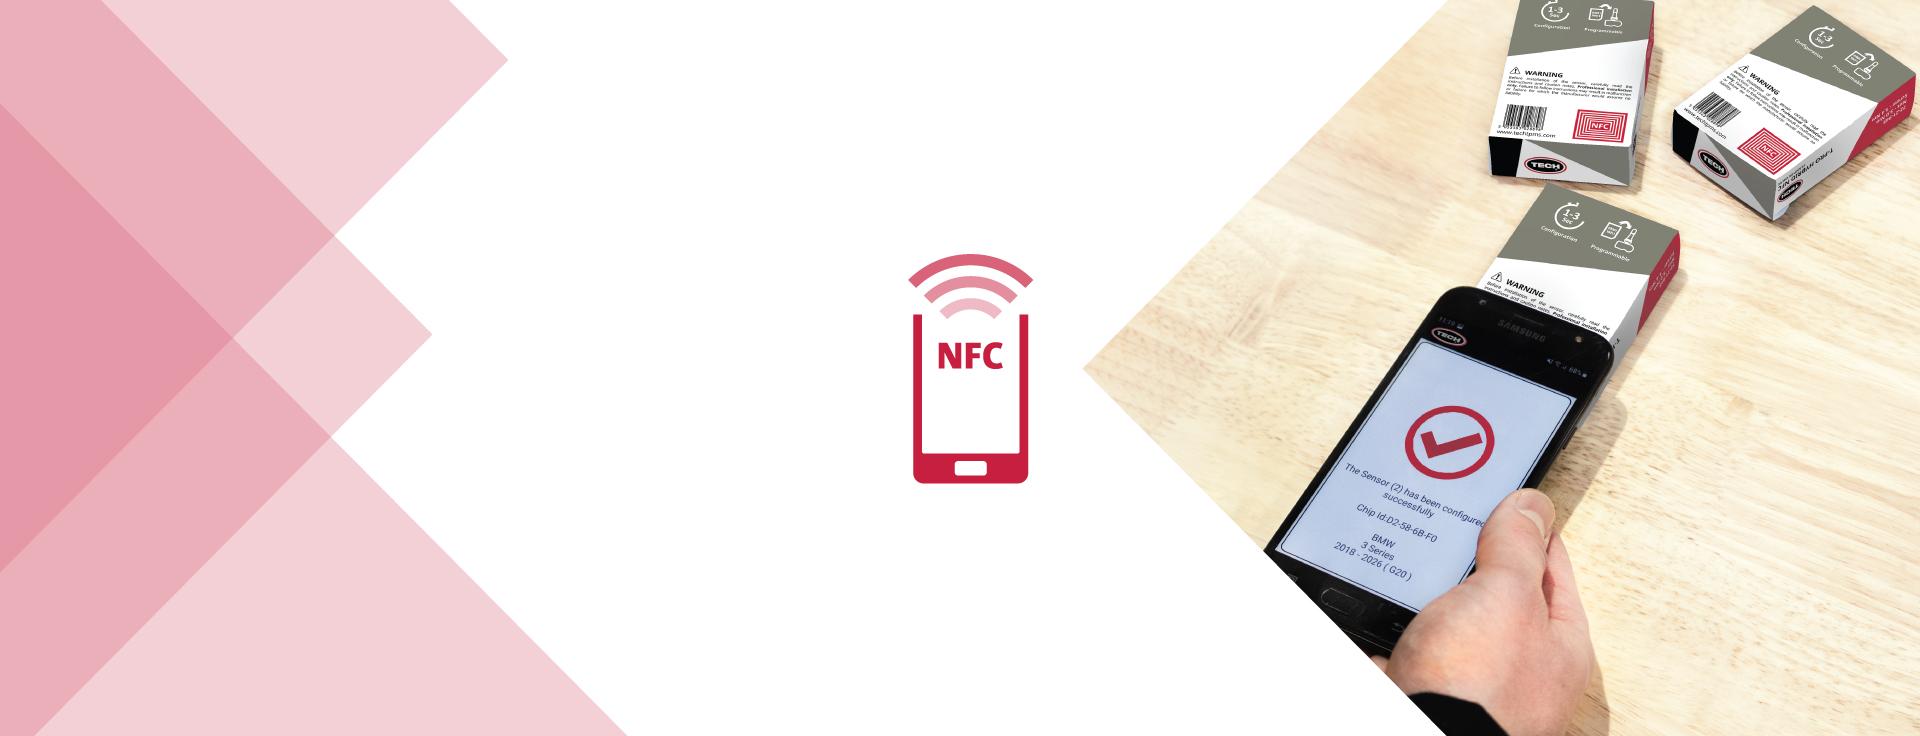 T-Pro Hybrid NFC